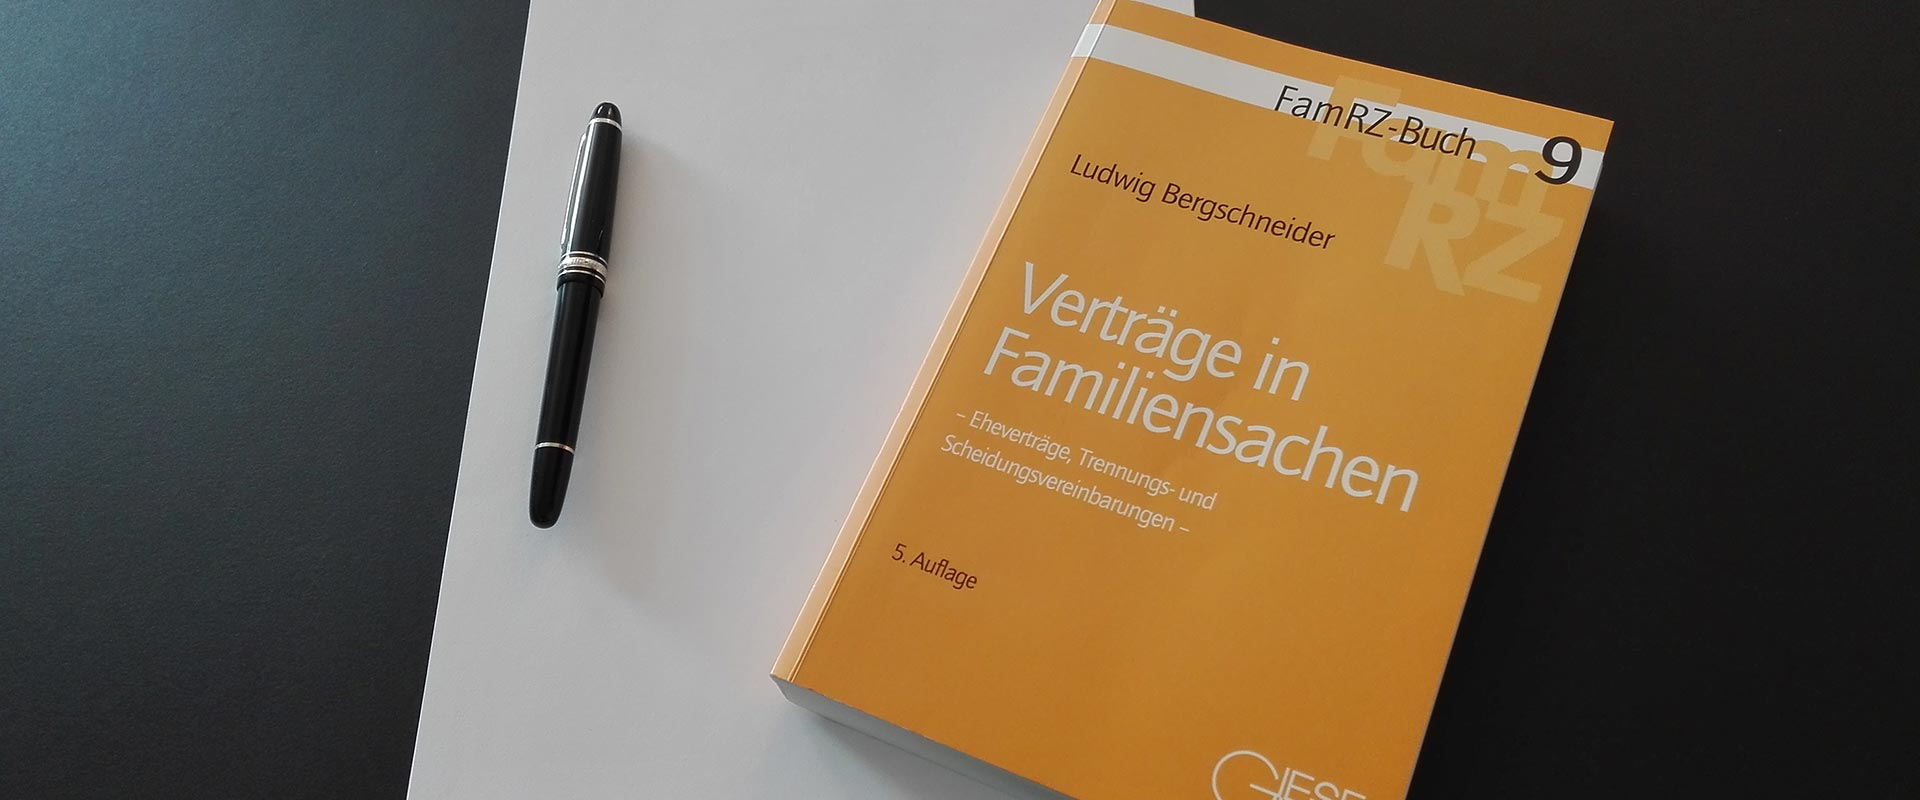 Vertragsrecht in Landshut